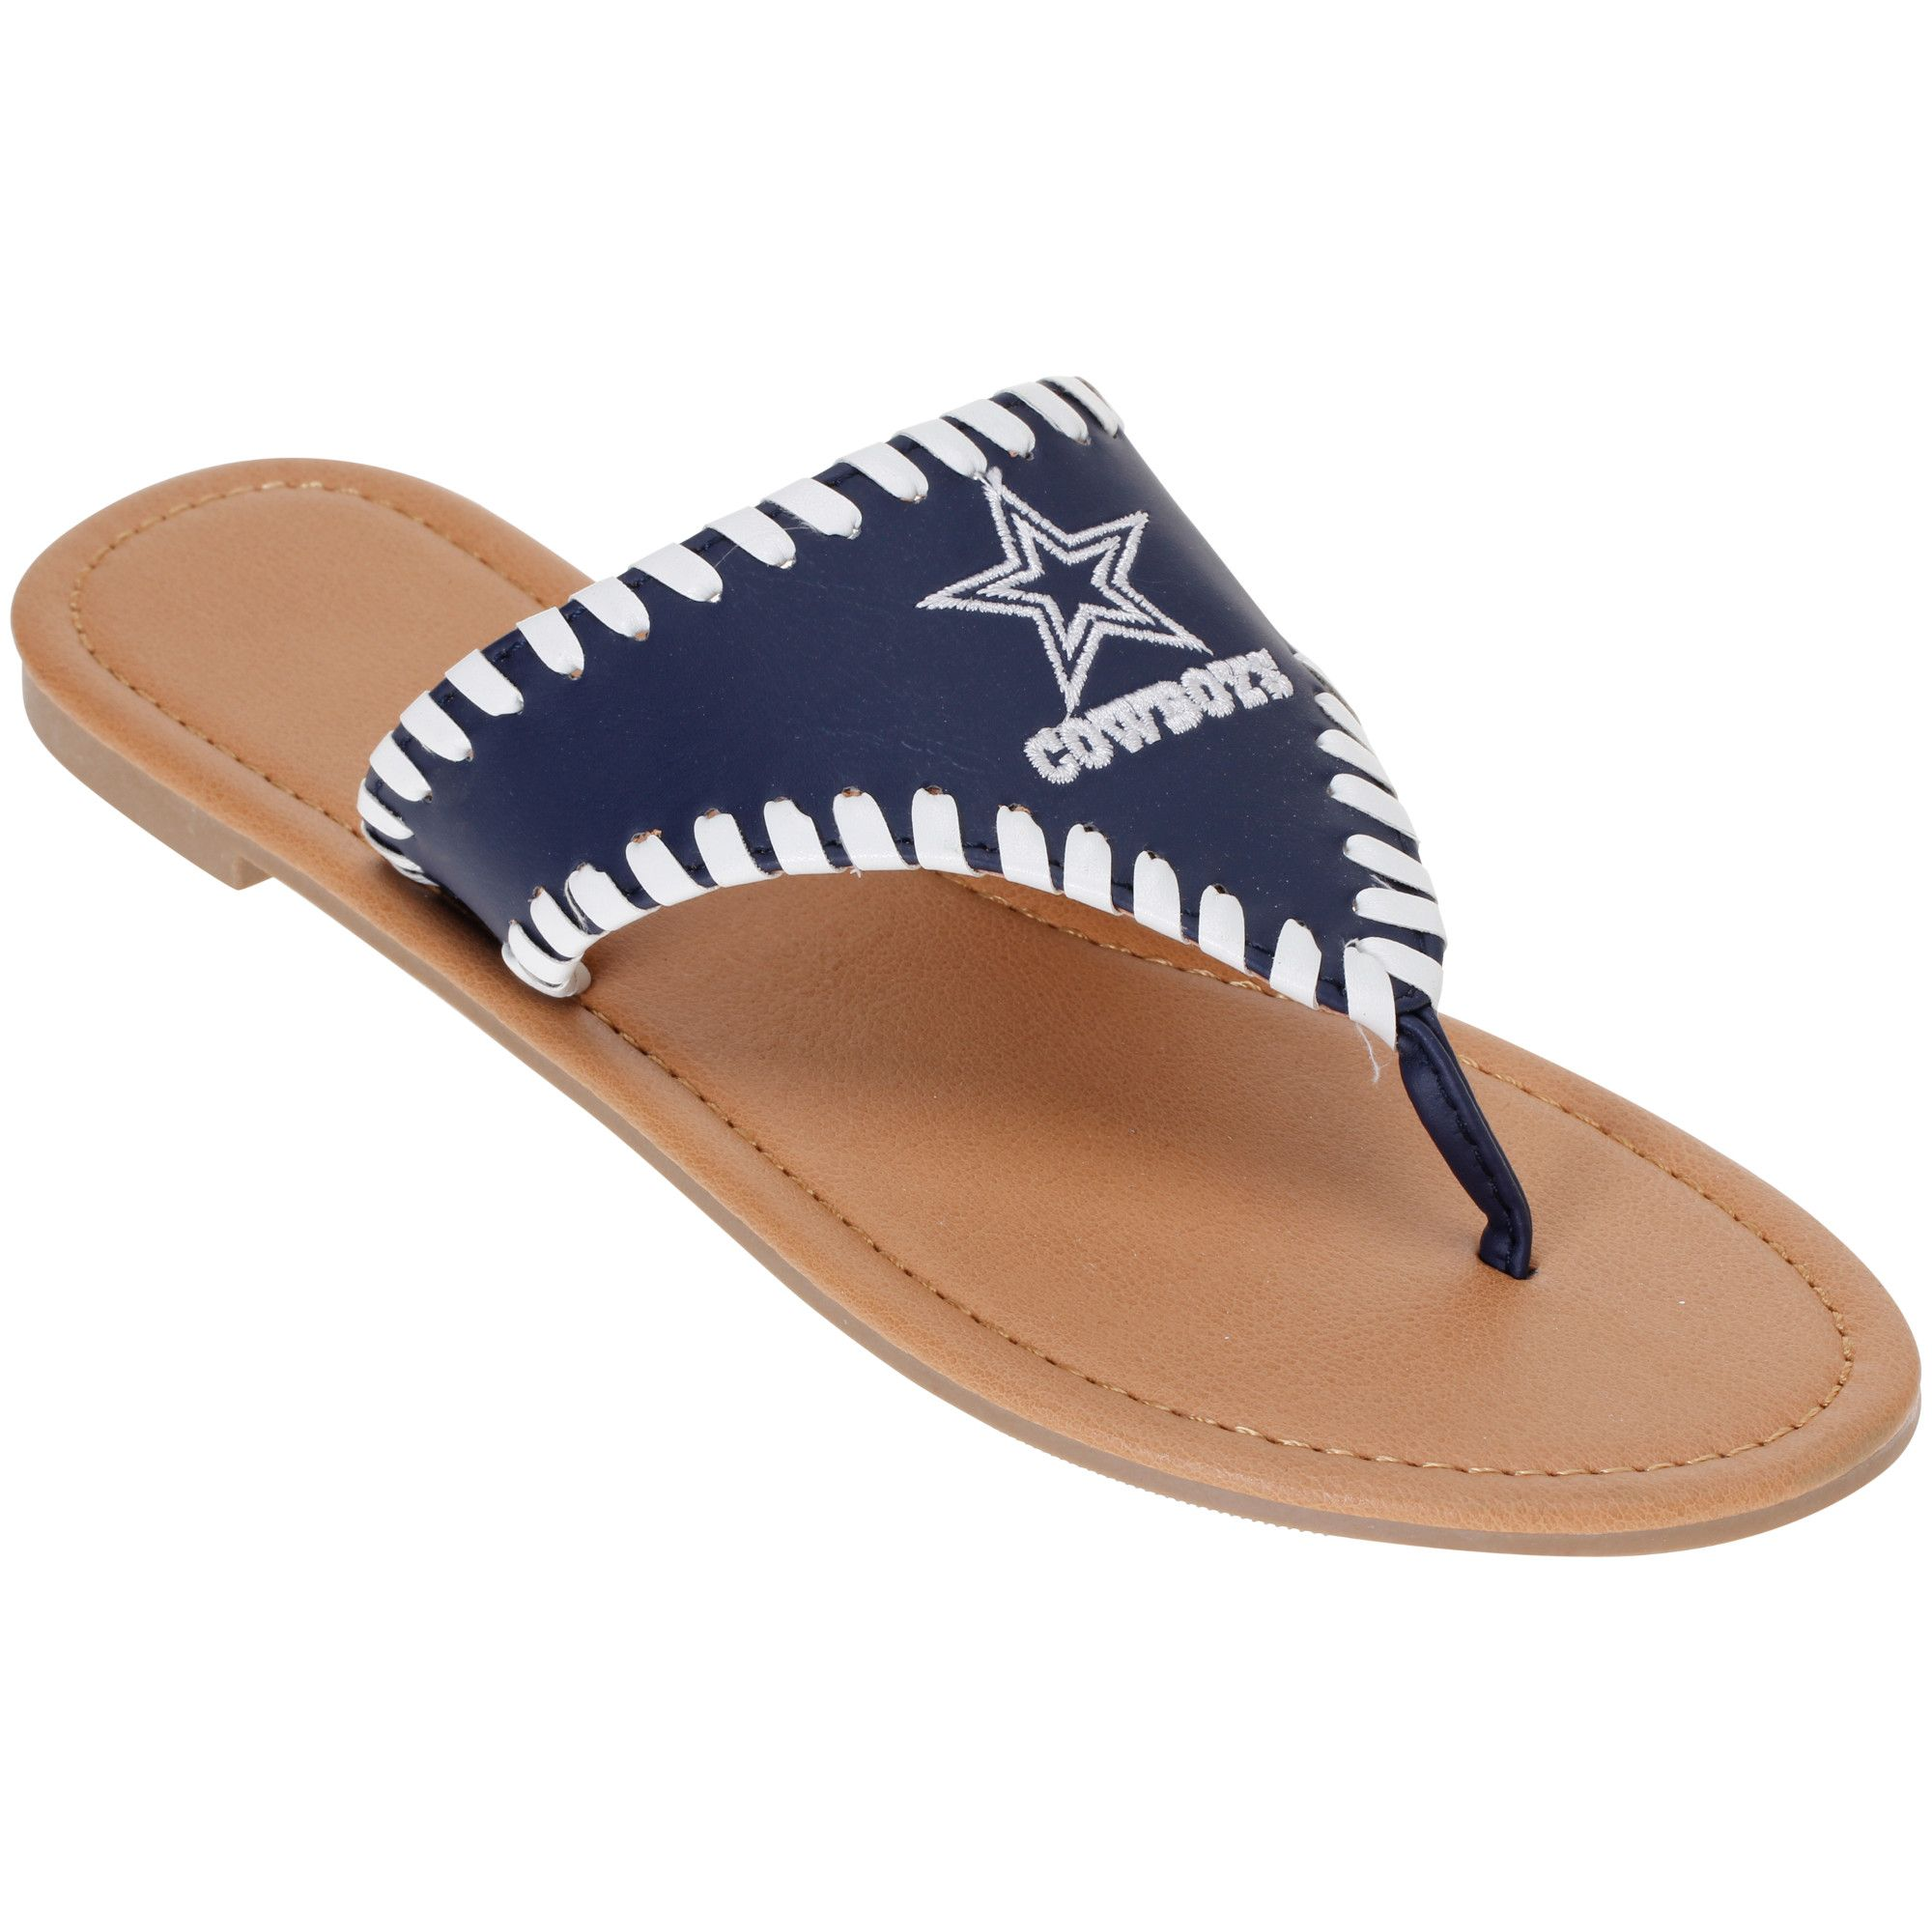 new concept e4e6f eecd2 NFL Dallas Cowboys Women s High End Sandals